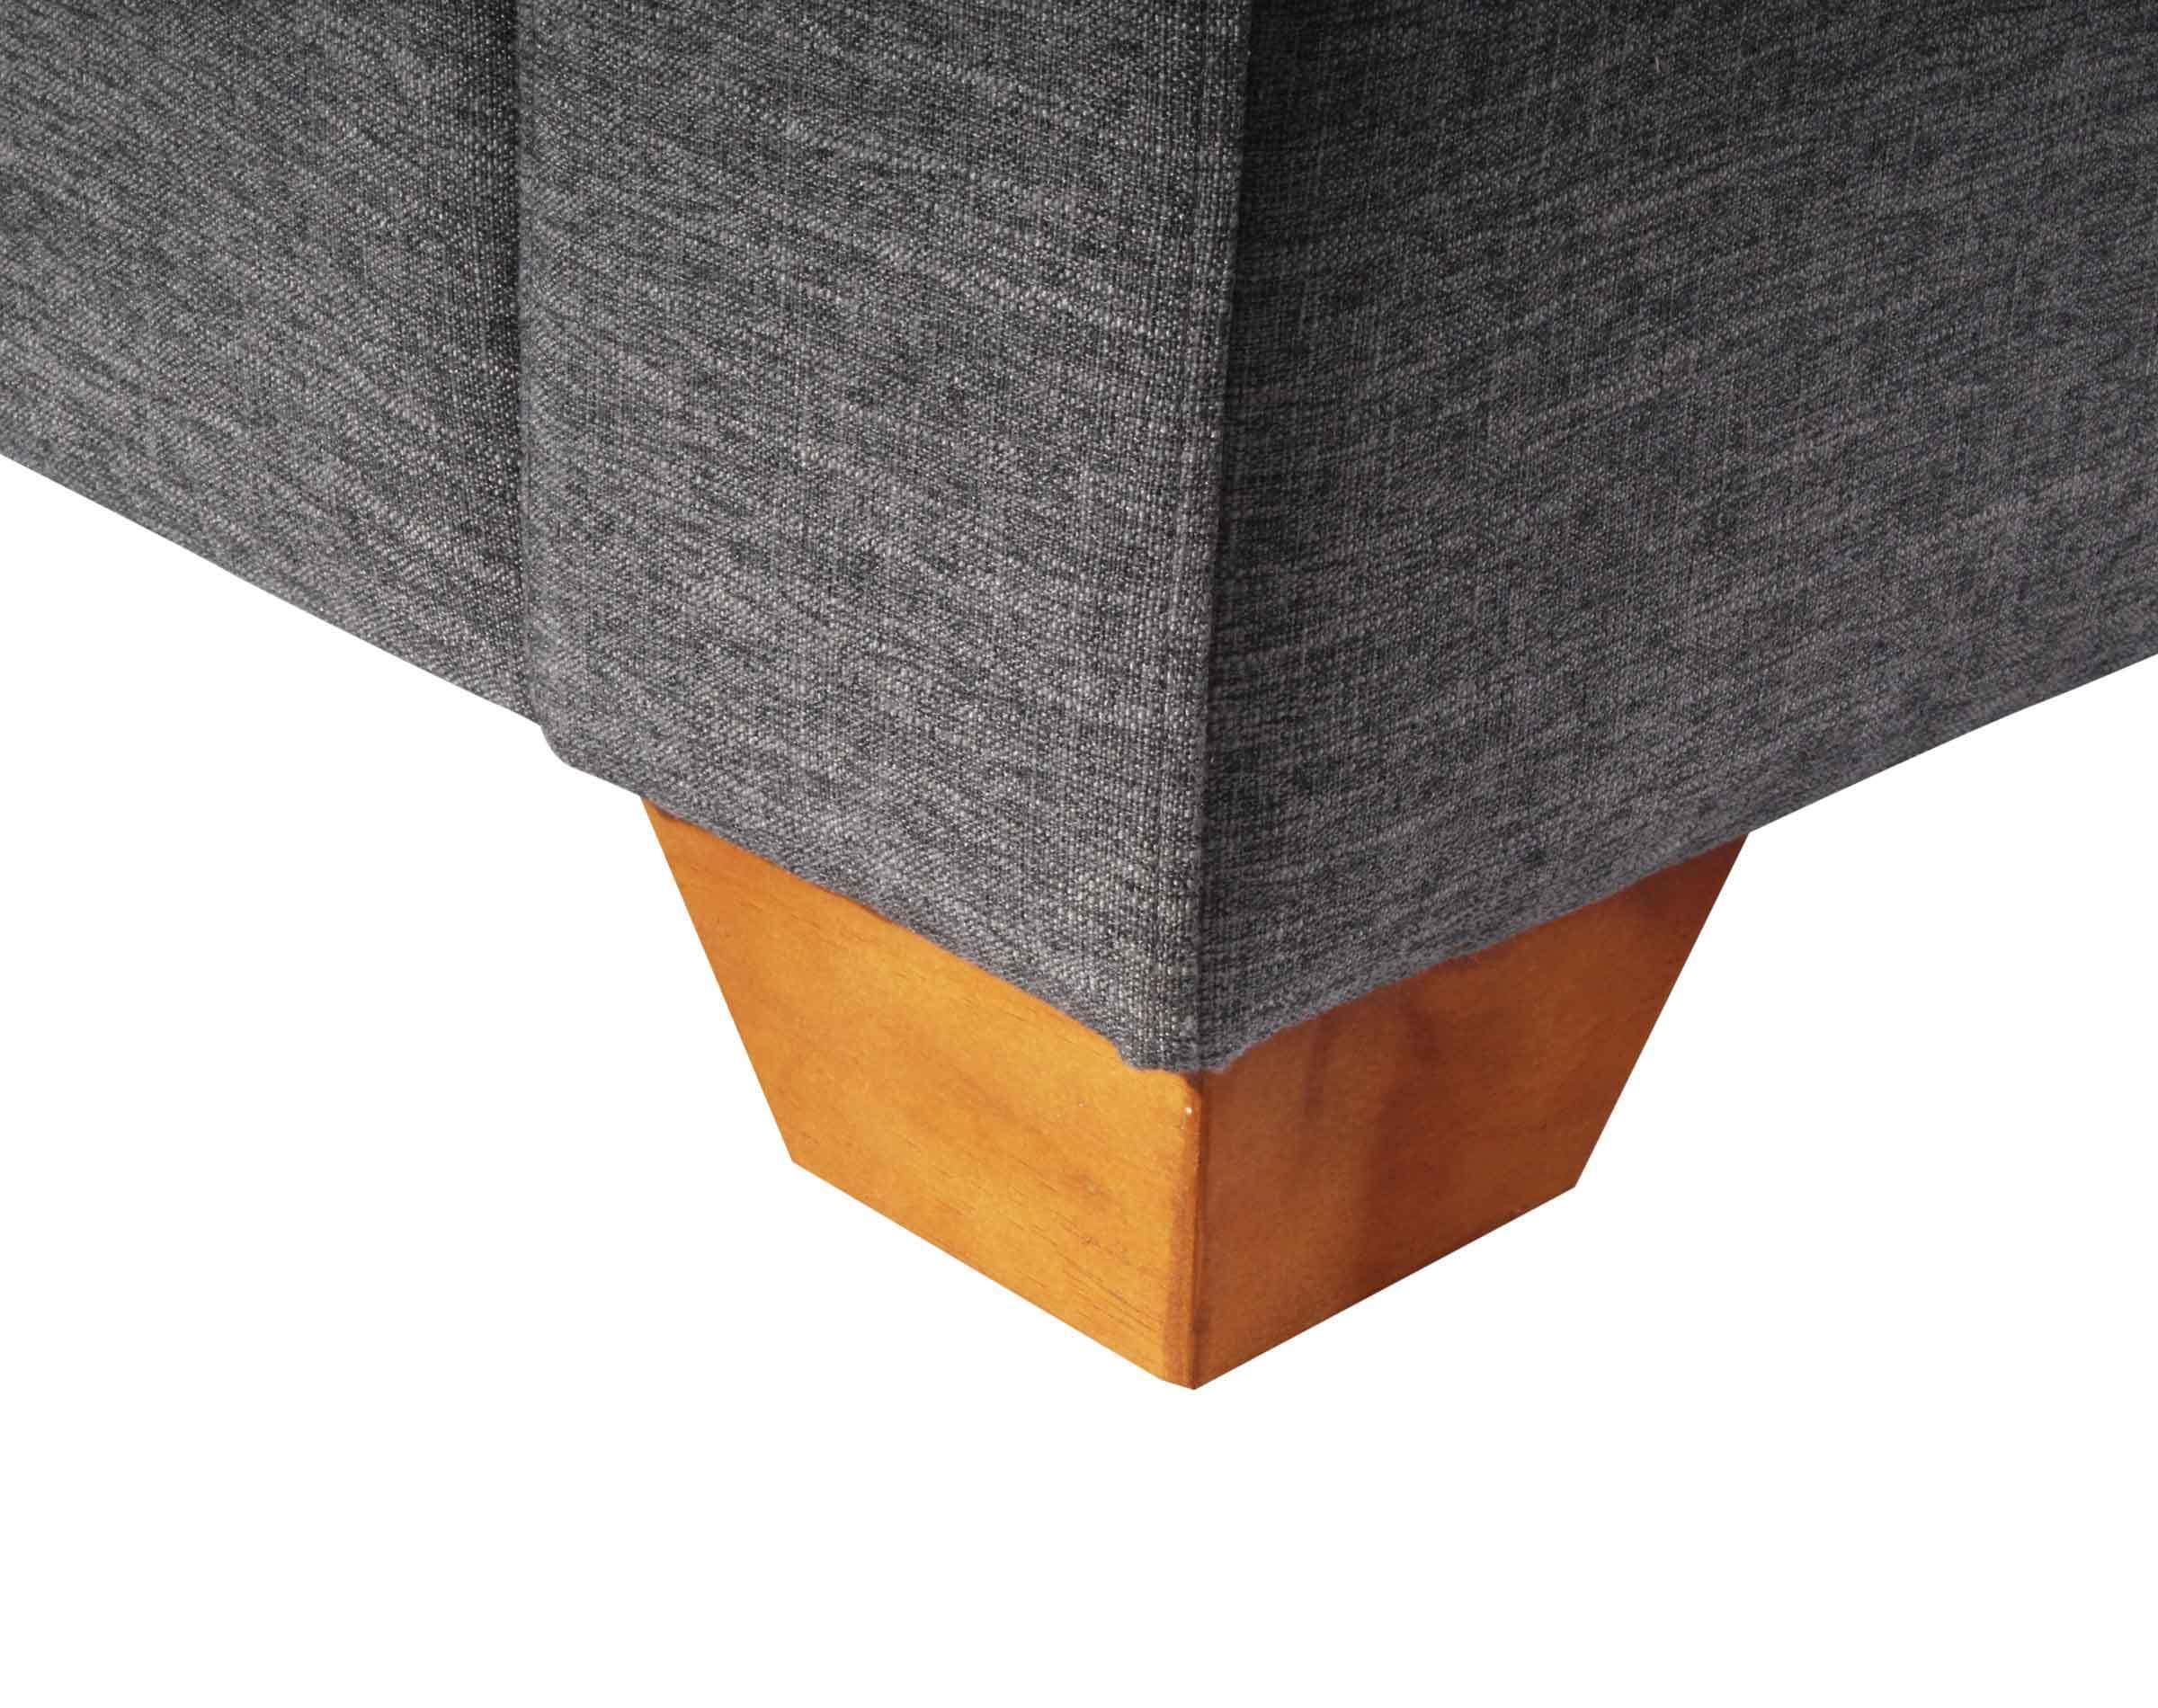 Sofa Thomas Inside Antimanchas Gris pata de madera